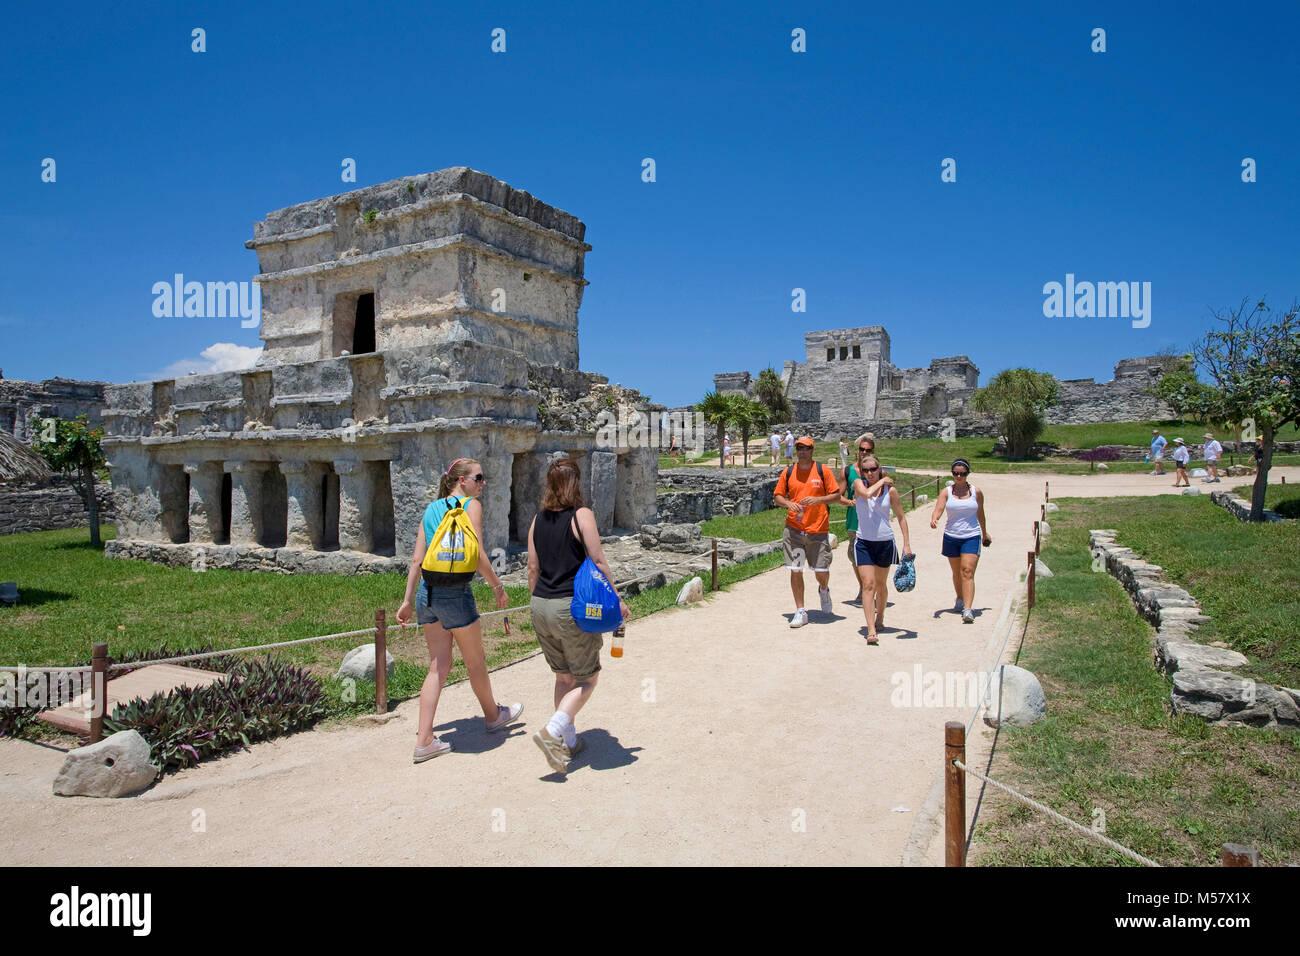 Maya ruins at Tulum, Archeological zone, Tulum, Riviera Maya, Yucatan, Quintana Roo, Mexico, Caribbean - Stock Image